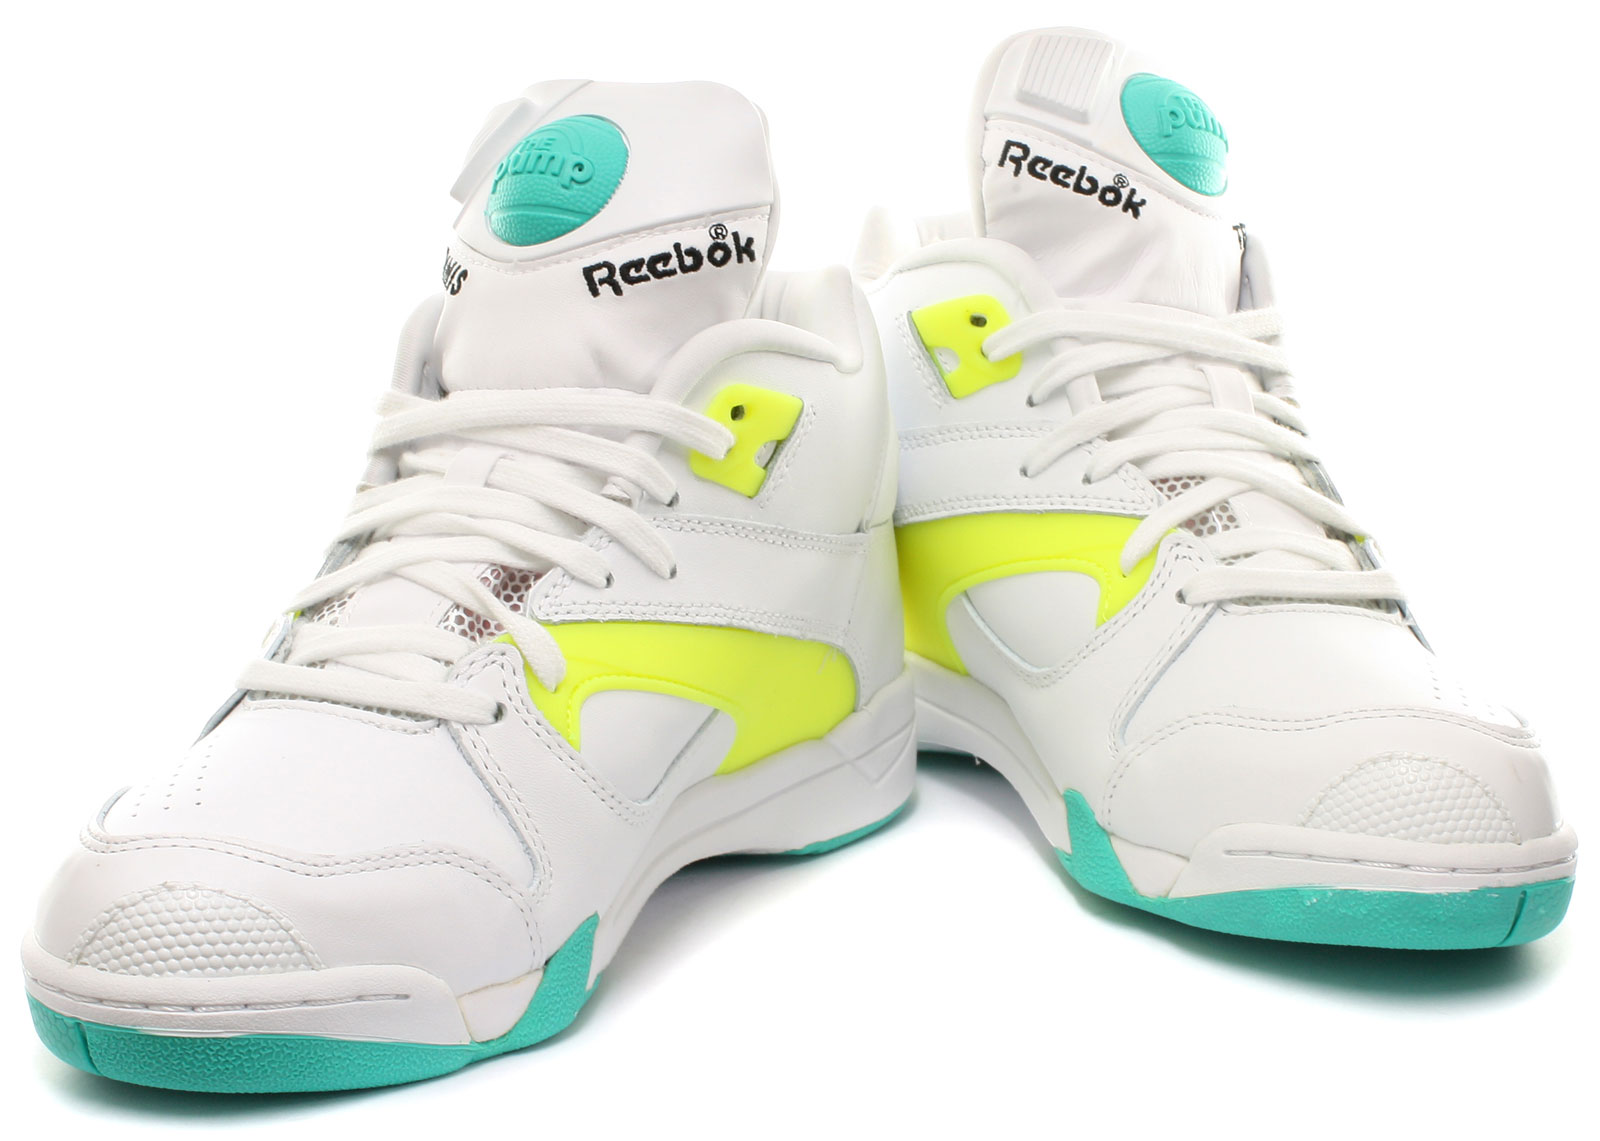 reebok classic court victory pump Sale 08bbf149cd4d